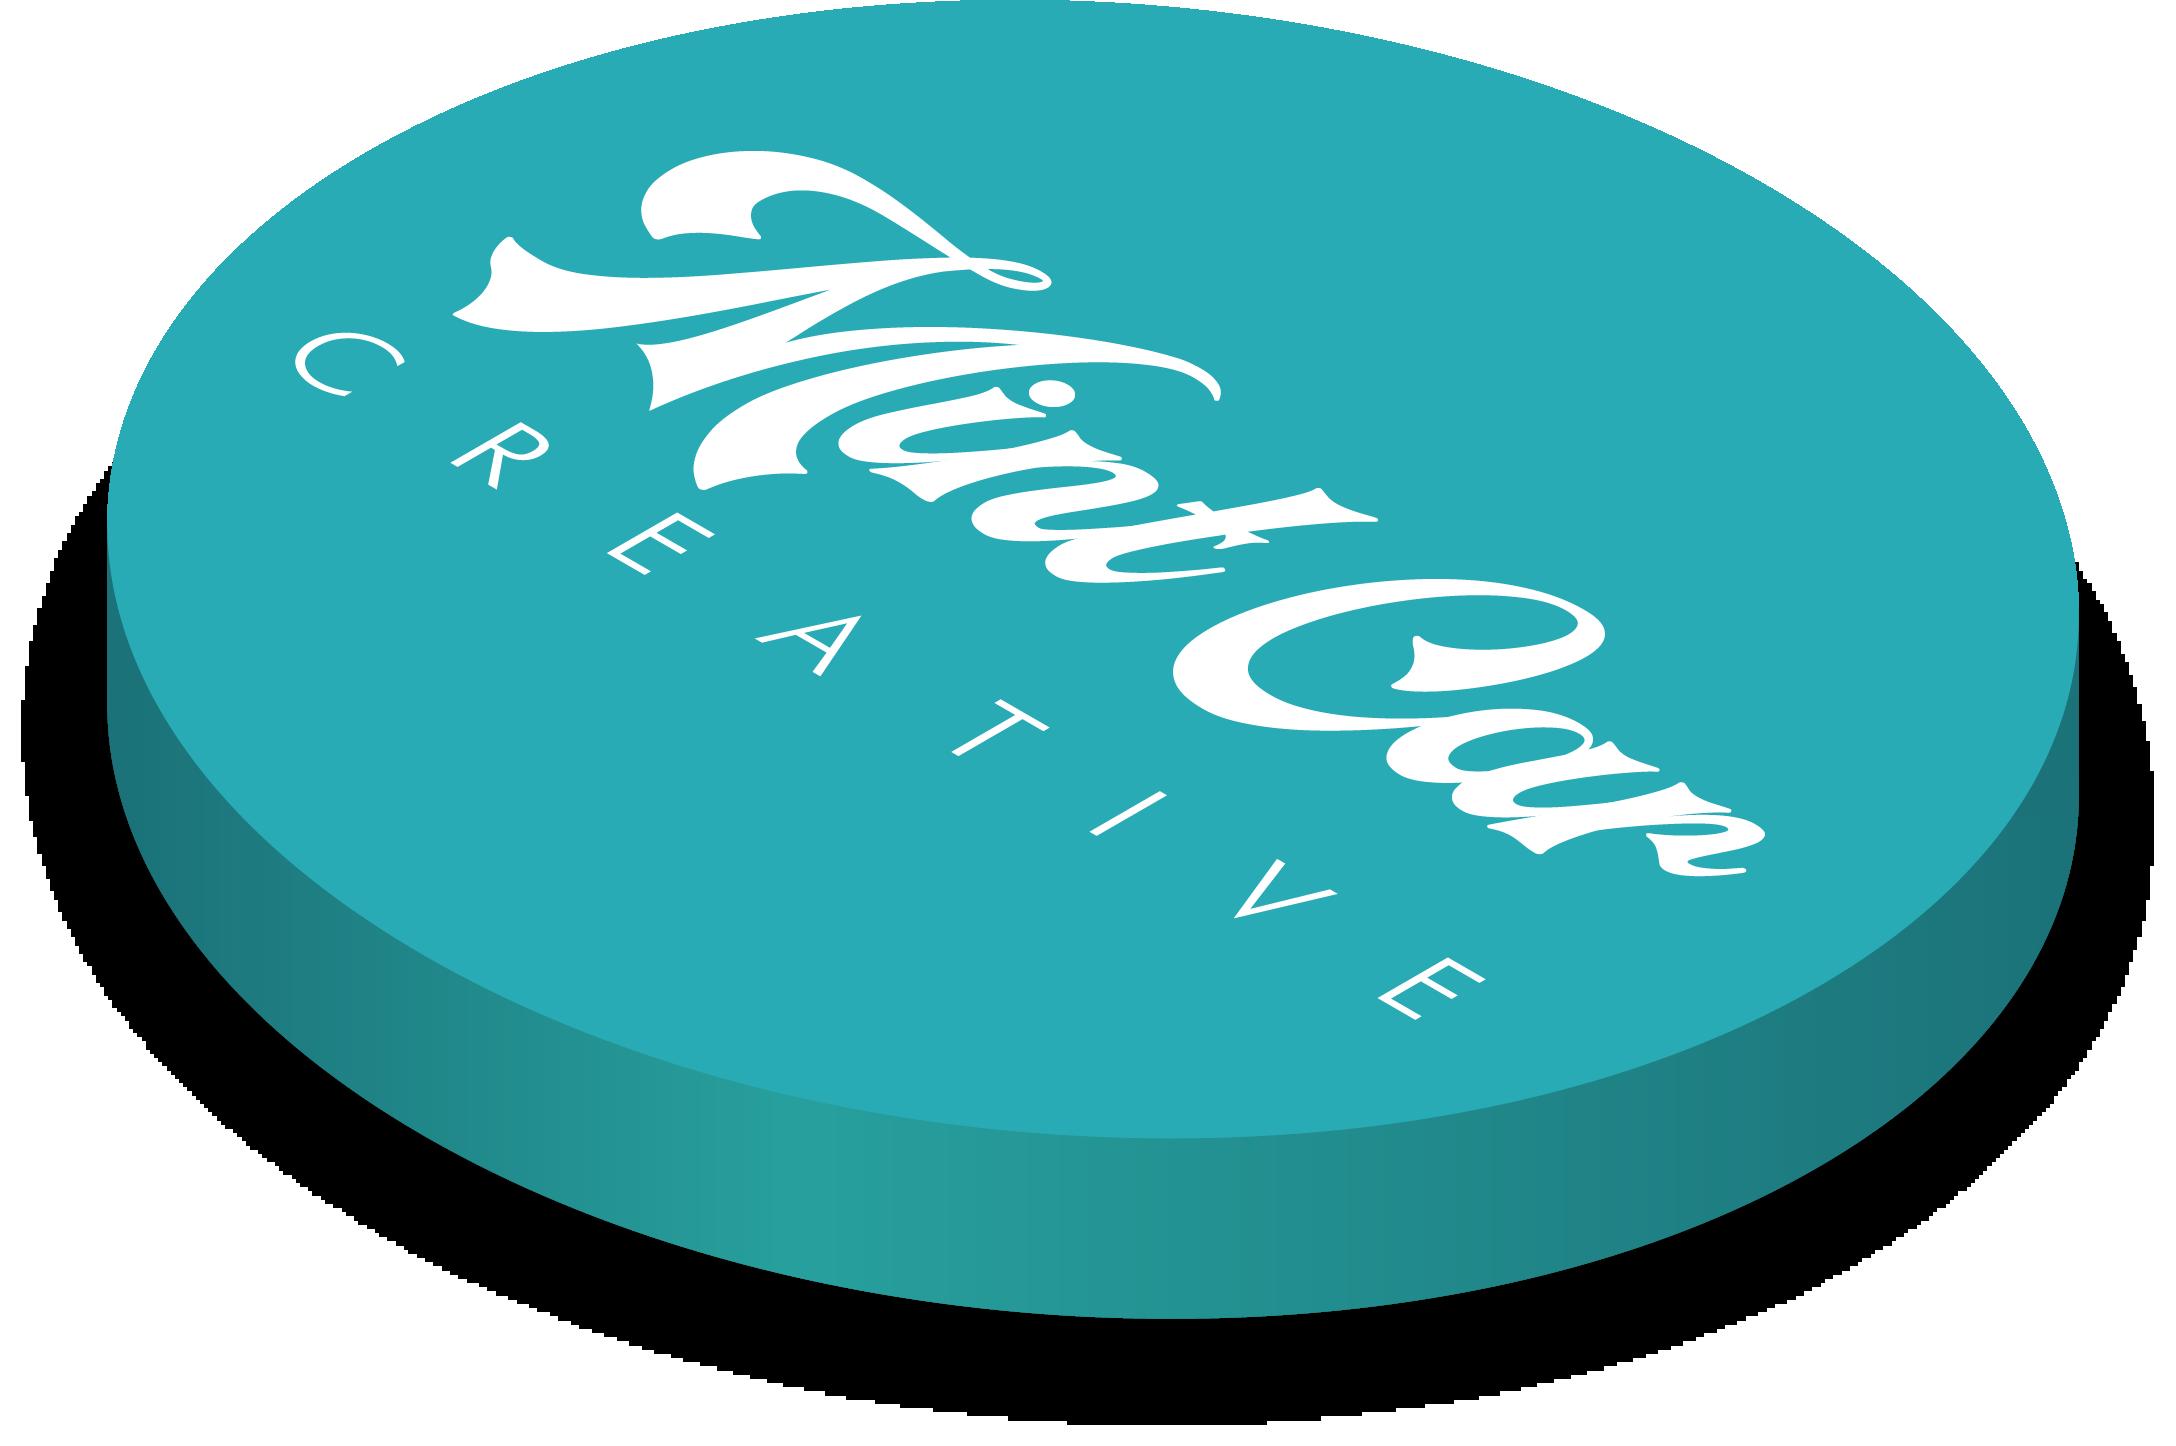 Mint Car Creative logo 3D